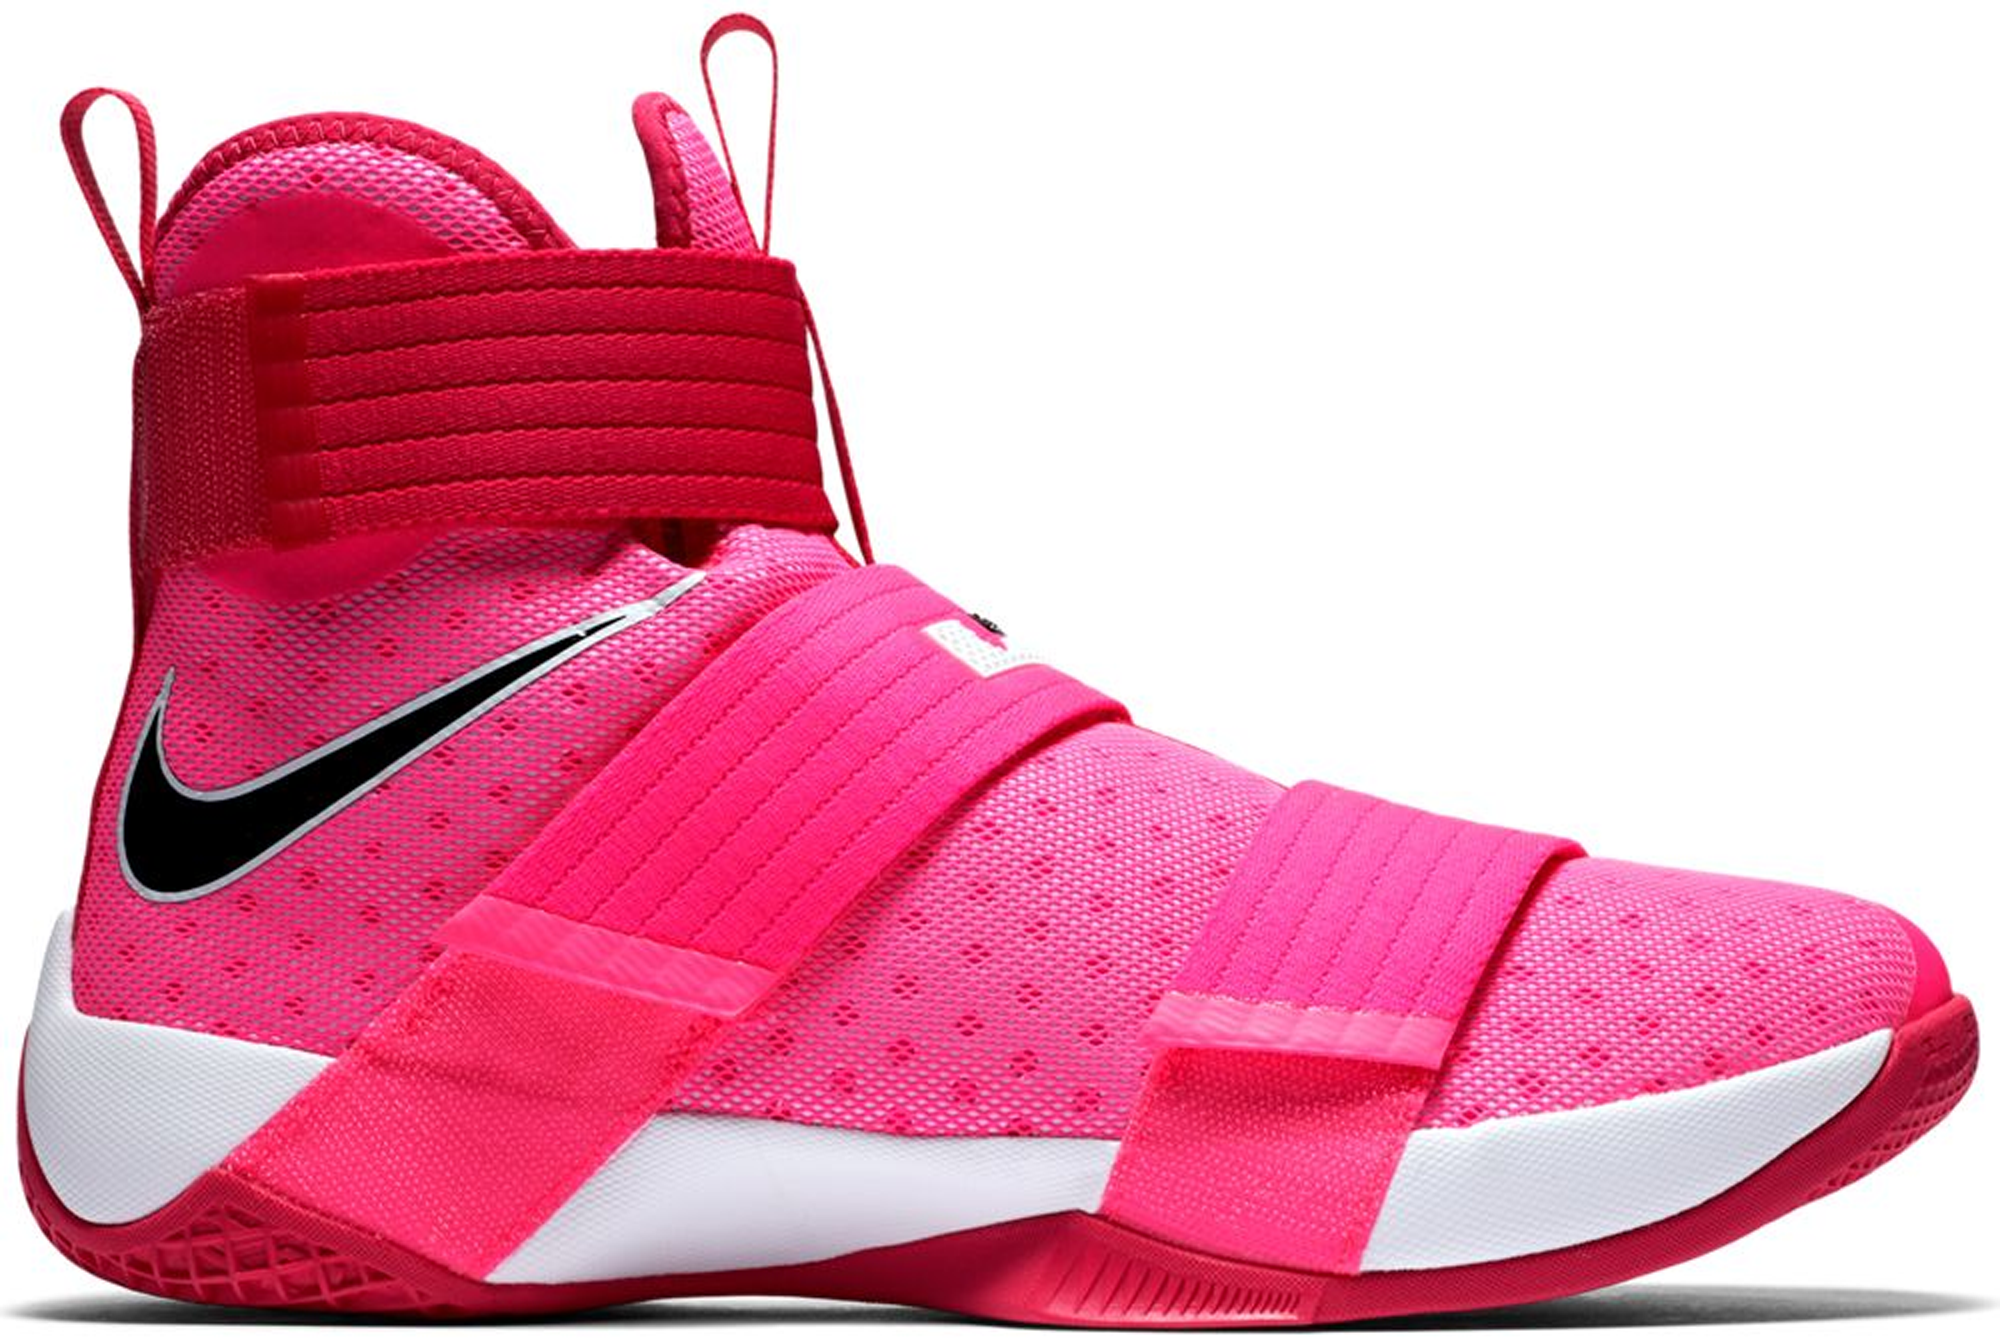 Nike LeBron Zoom Soldier 10 Think Pink